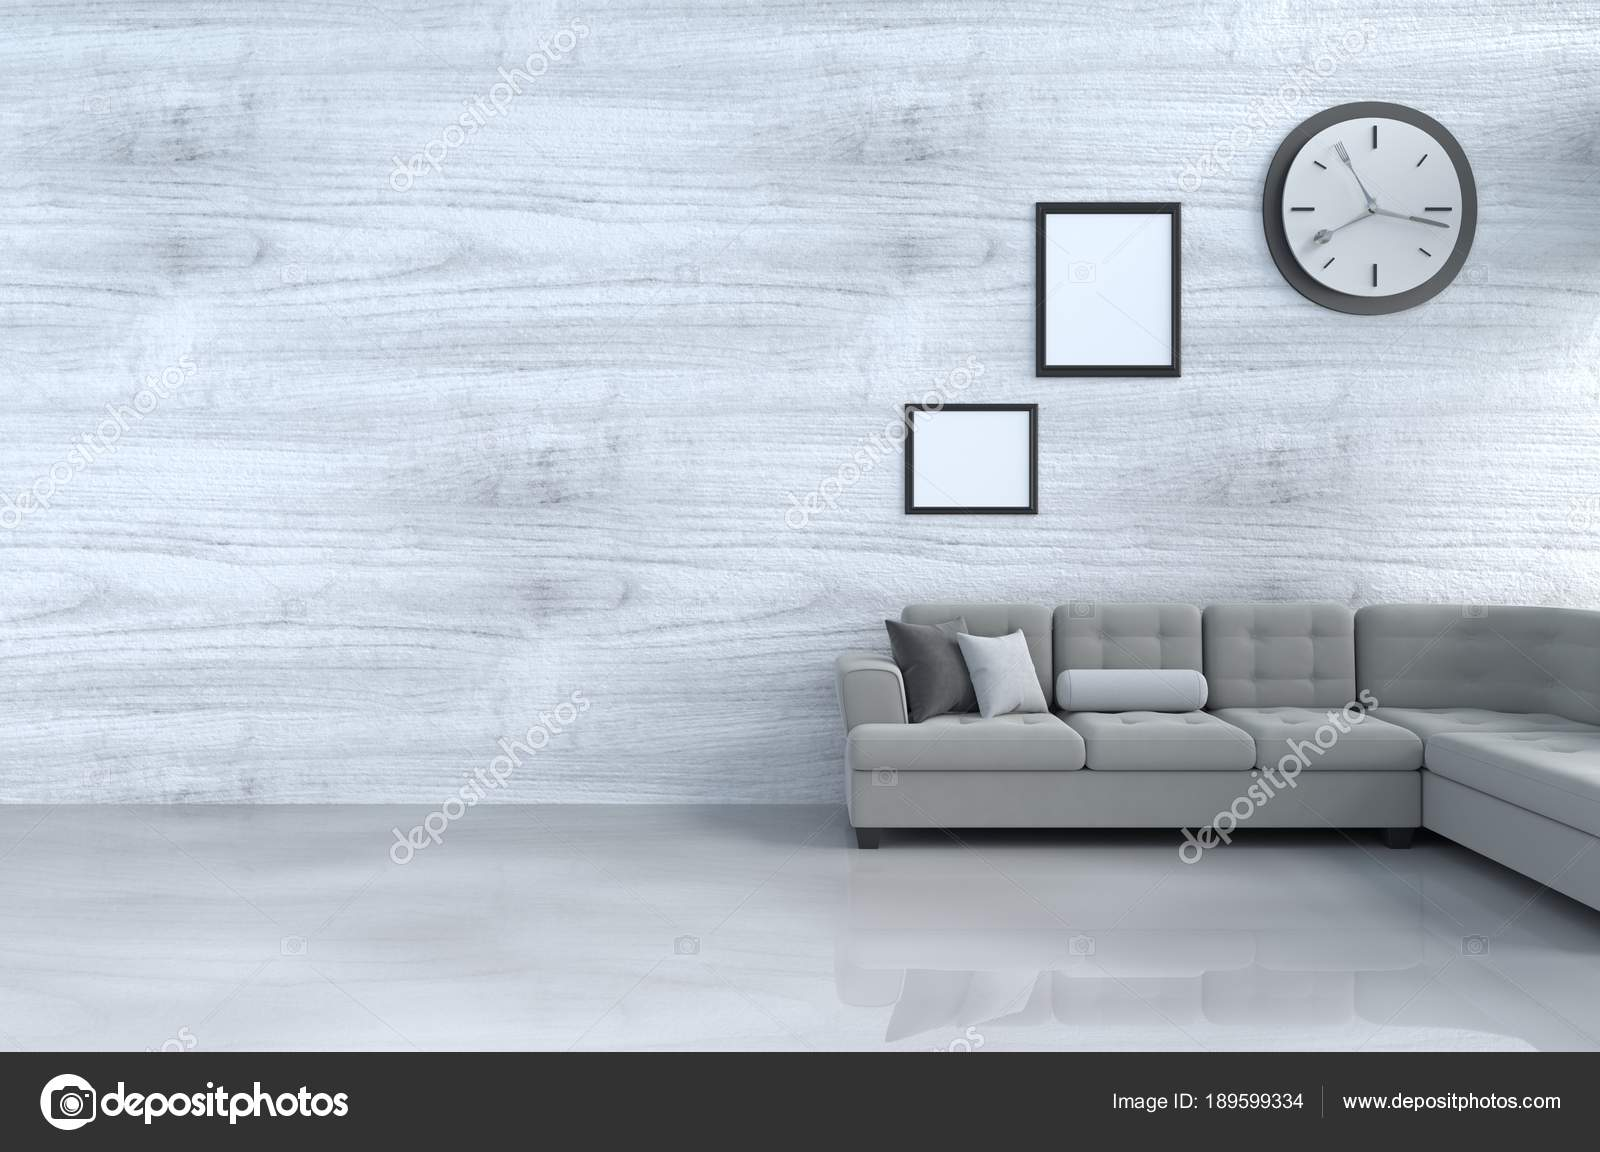 Decoraci n sal n color blanco con sof gris reloj pared for Decoracion salon con sofa gris